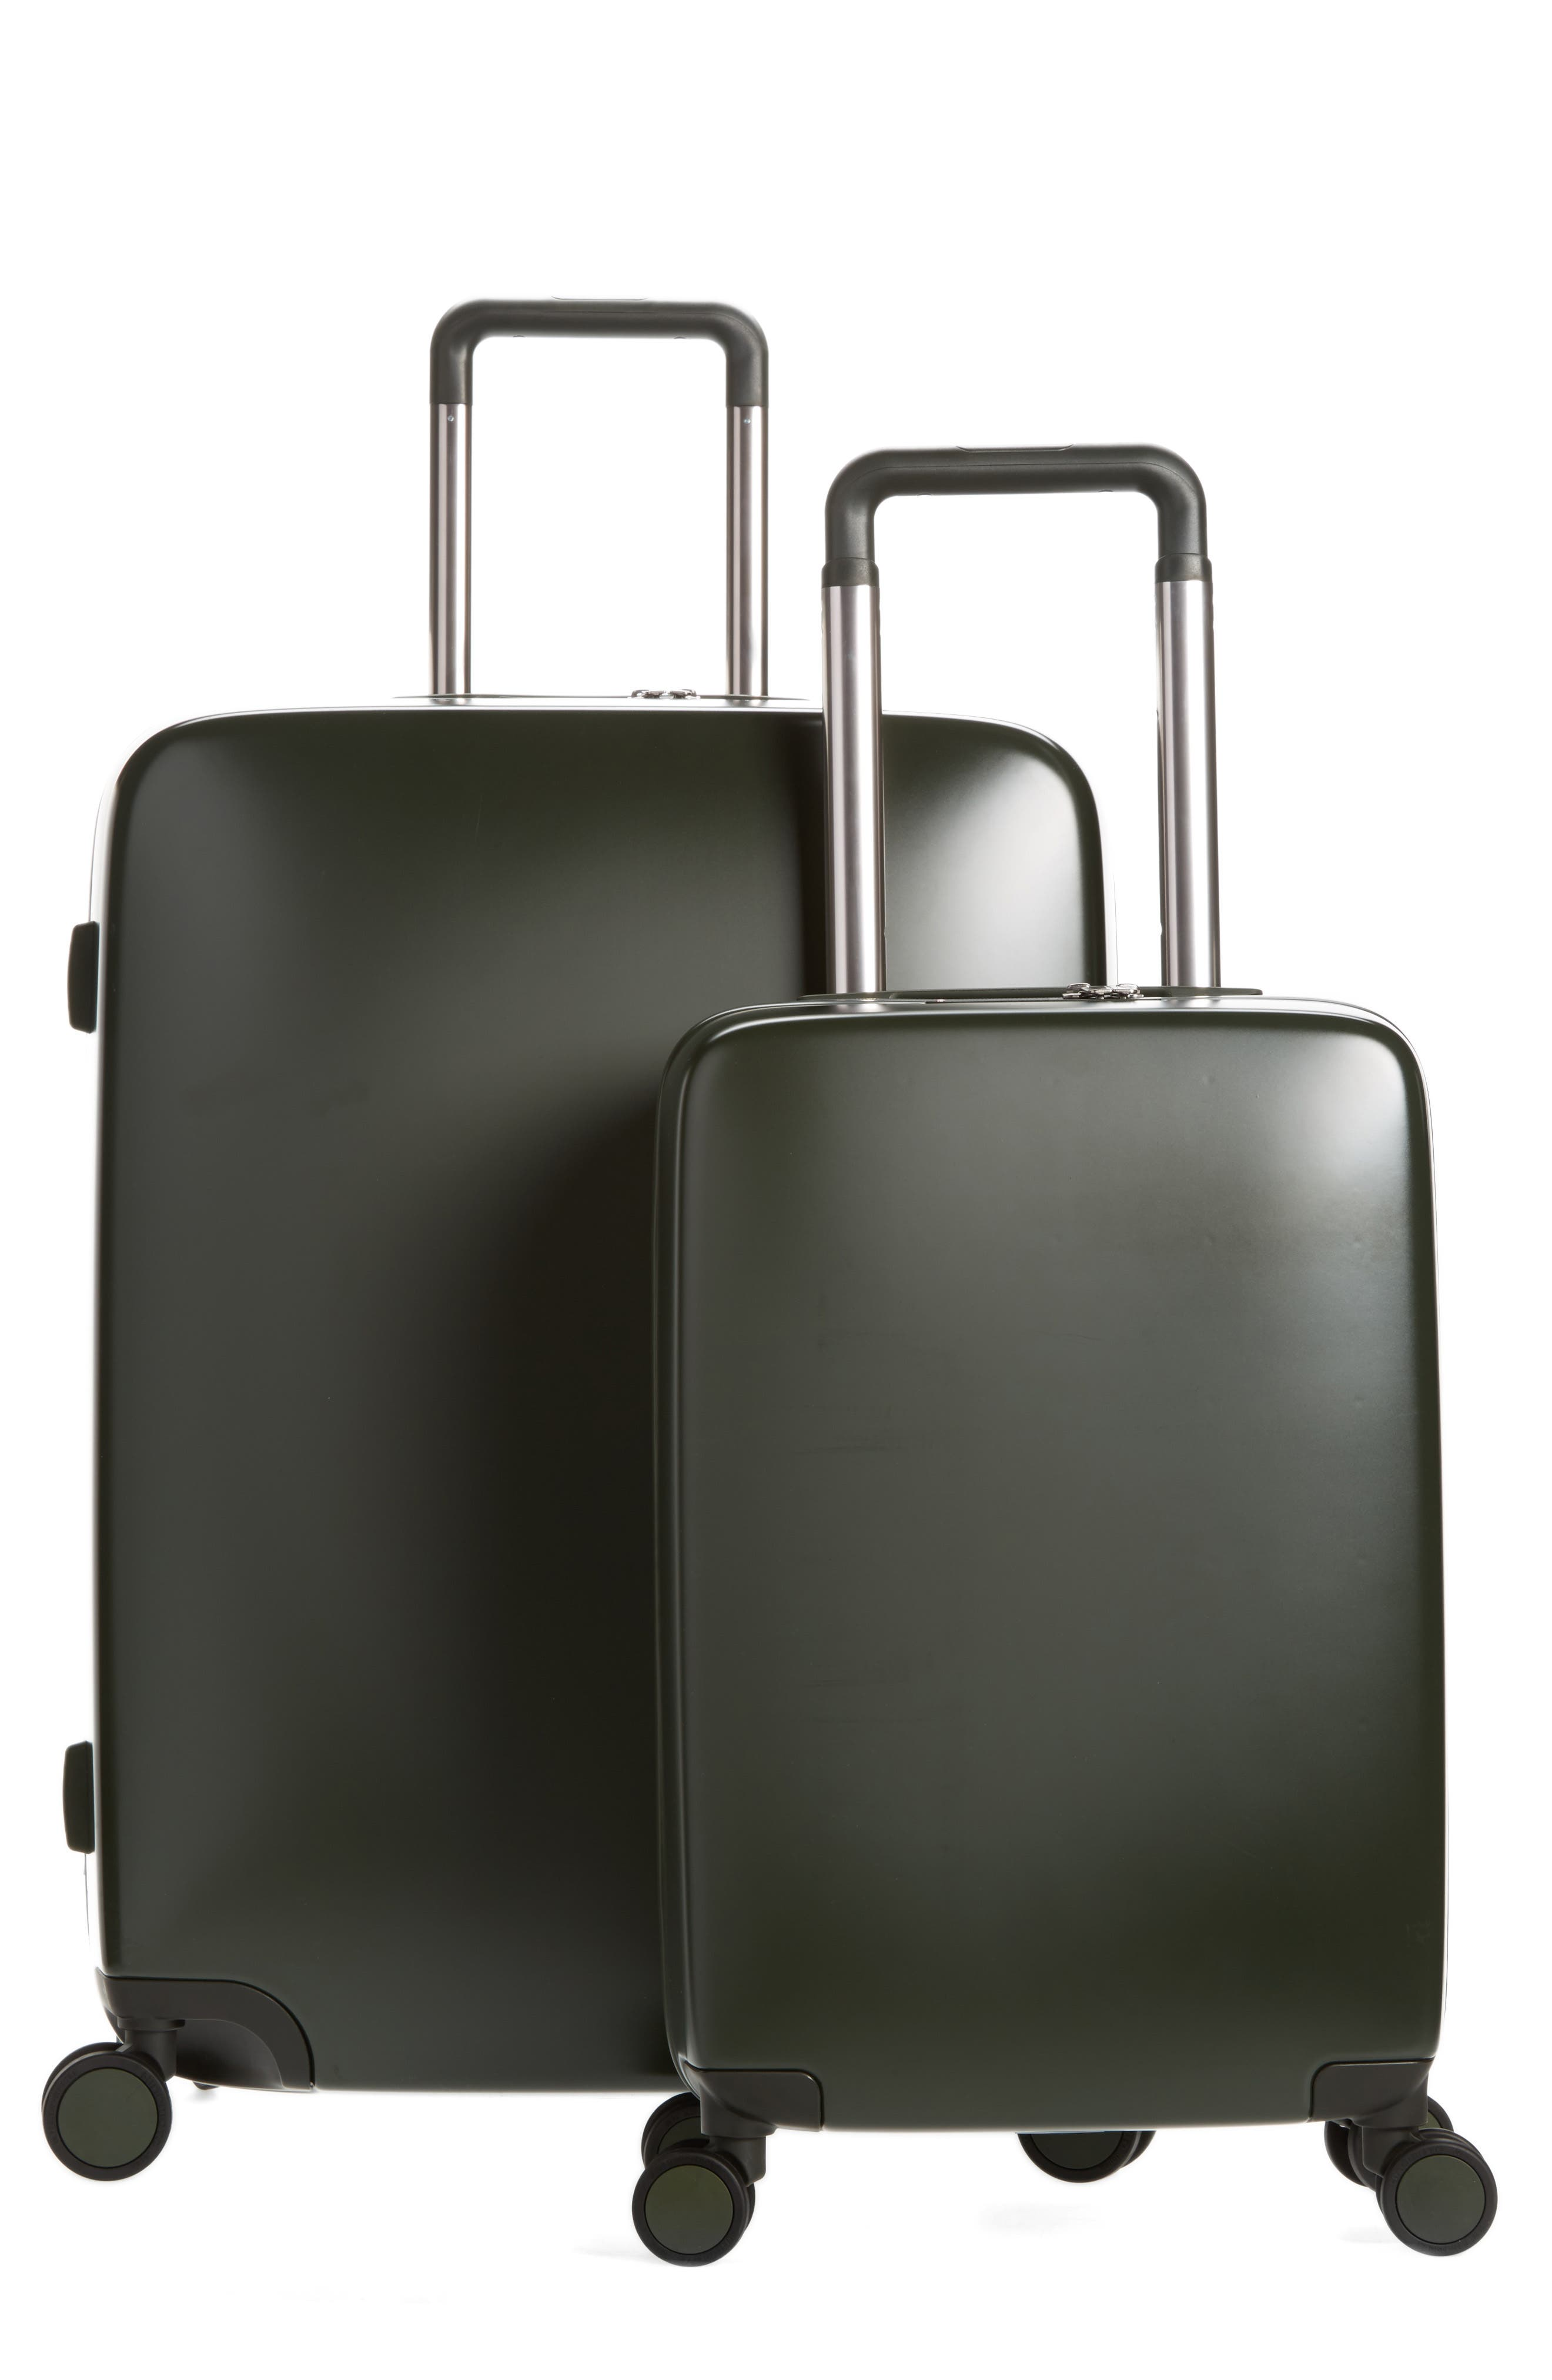 Raden The A50 28-Inch & 22-Inch 2-Piece Luggage Set